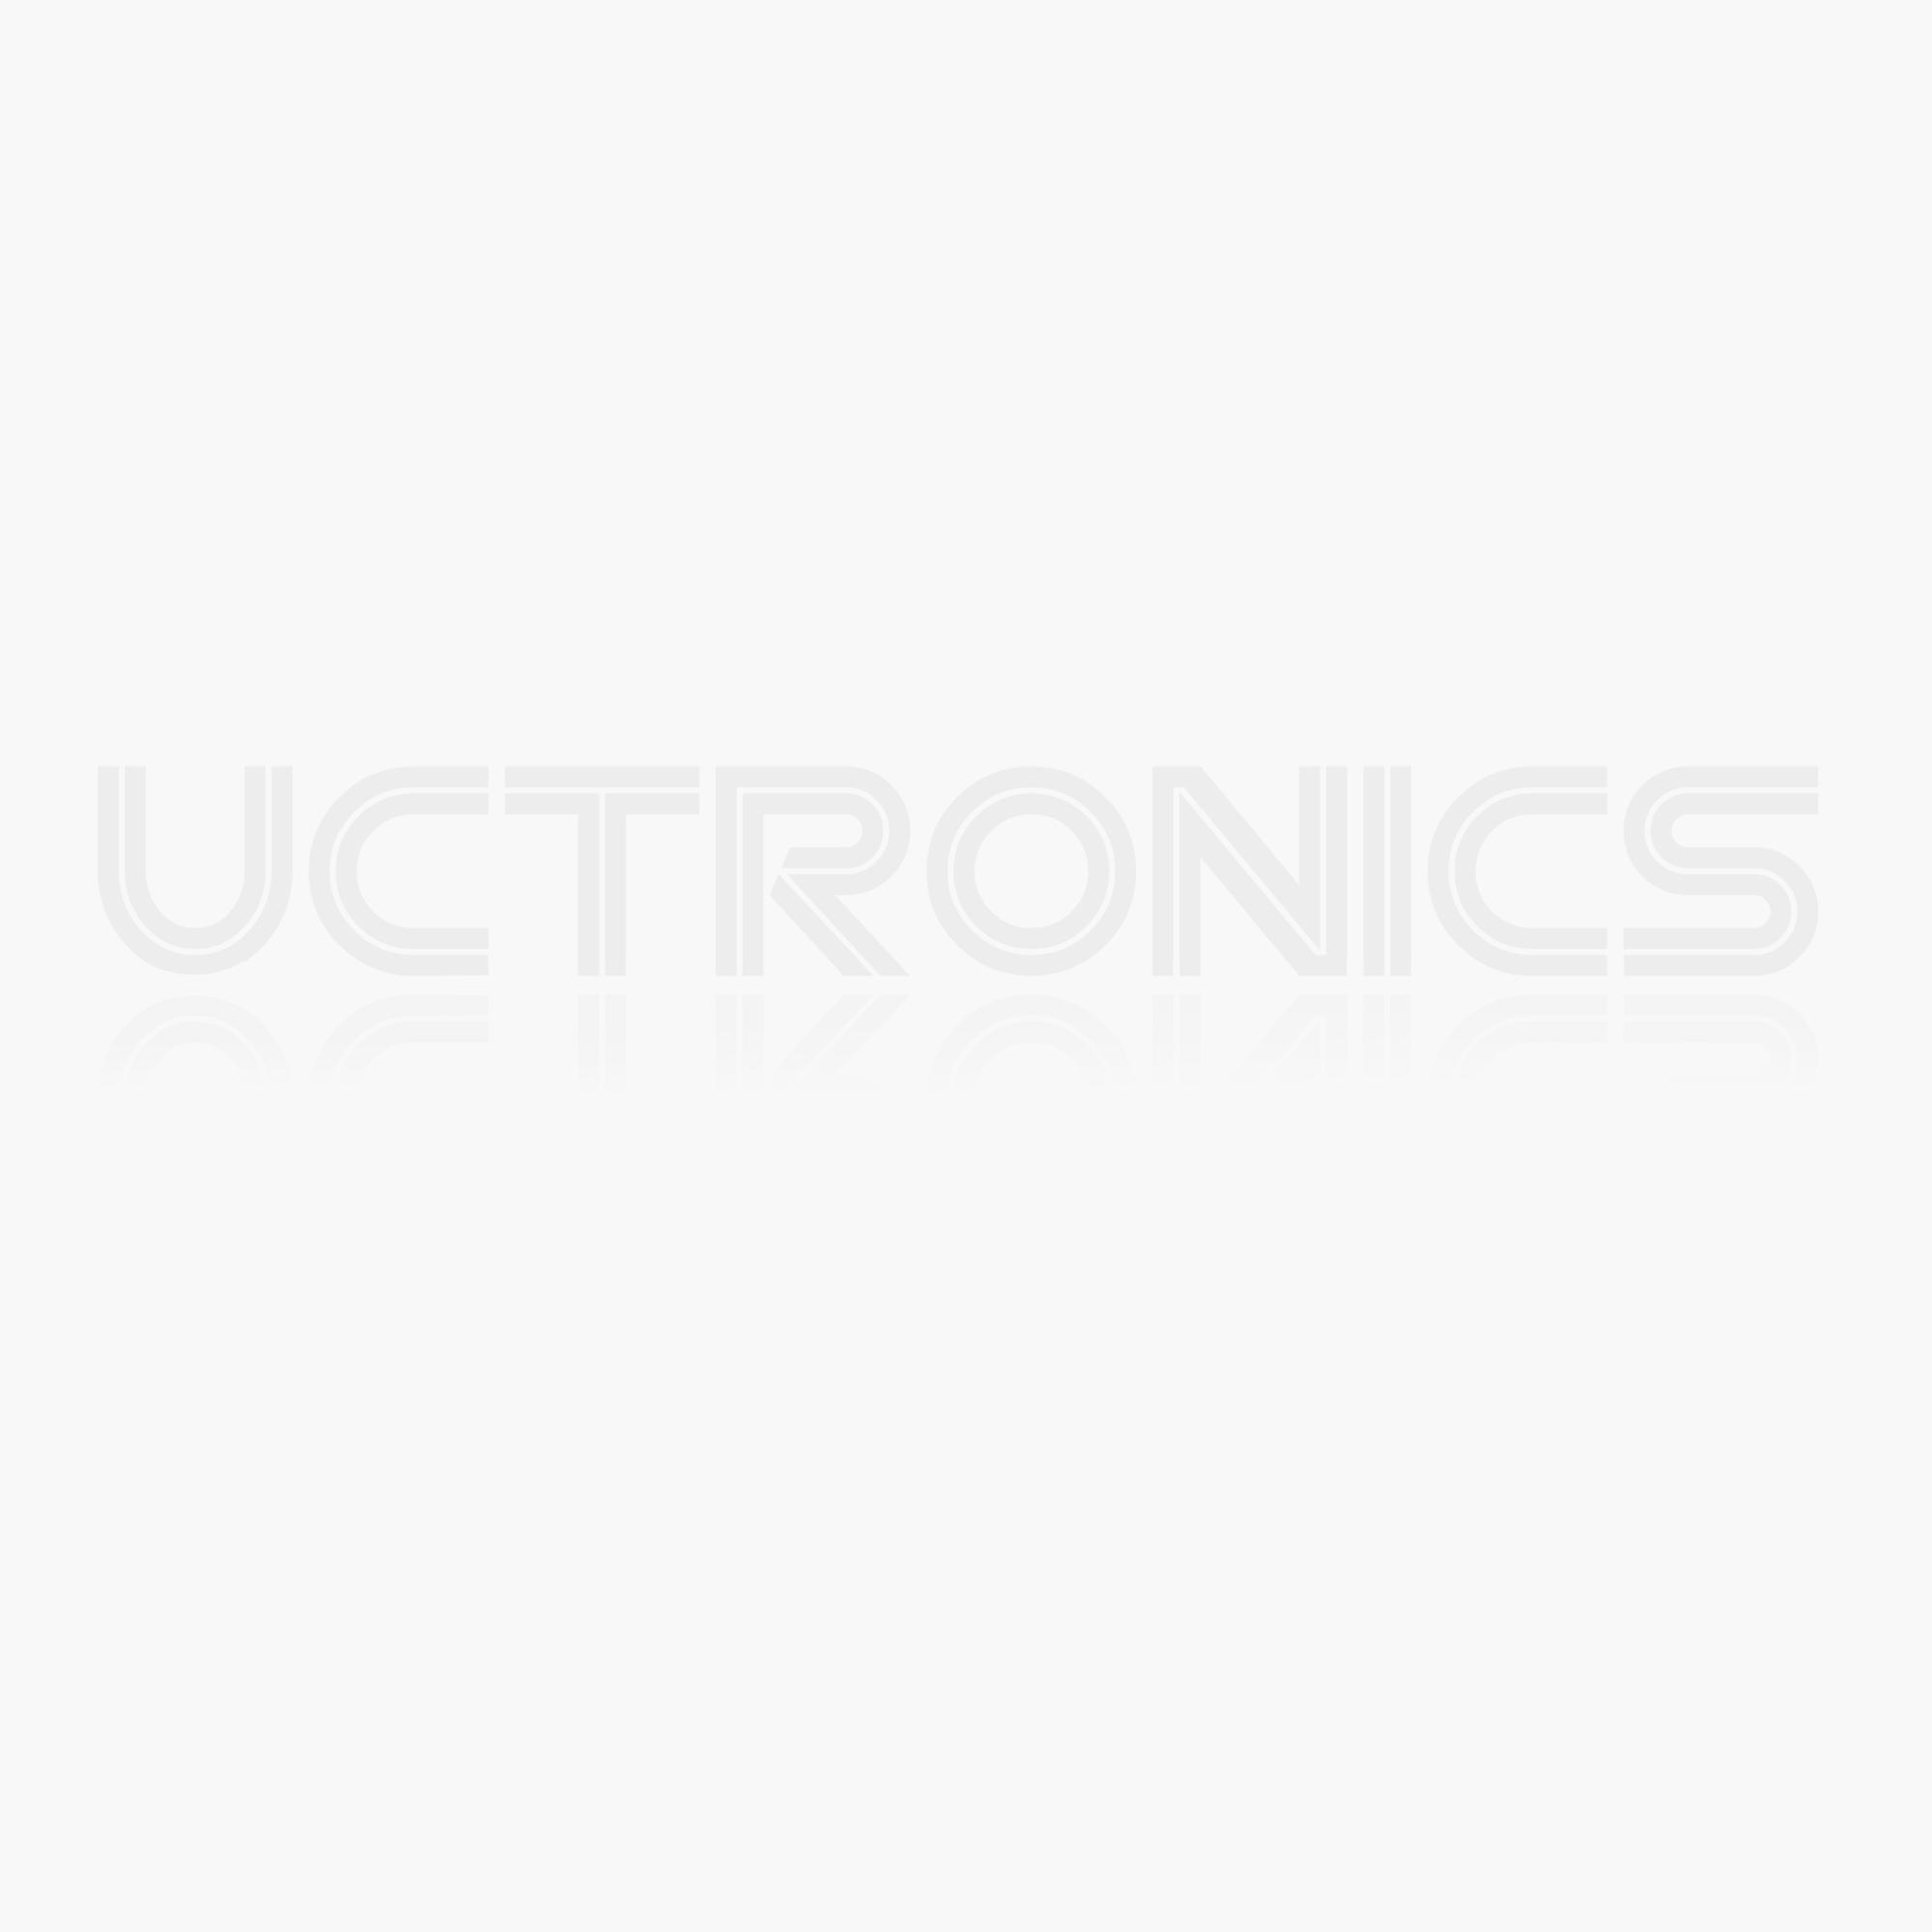 10pcs Amplifier potentiometer B10K handle length 15mm /w Screw Gasket